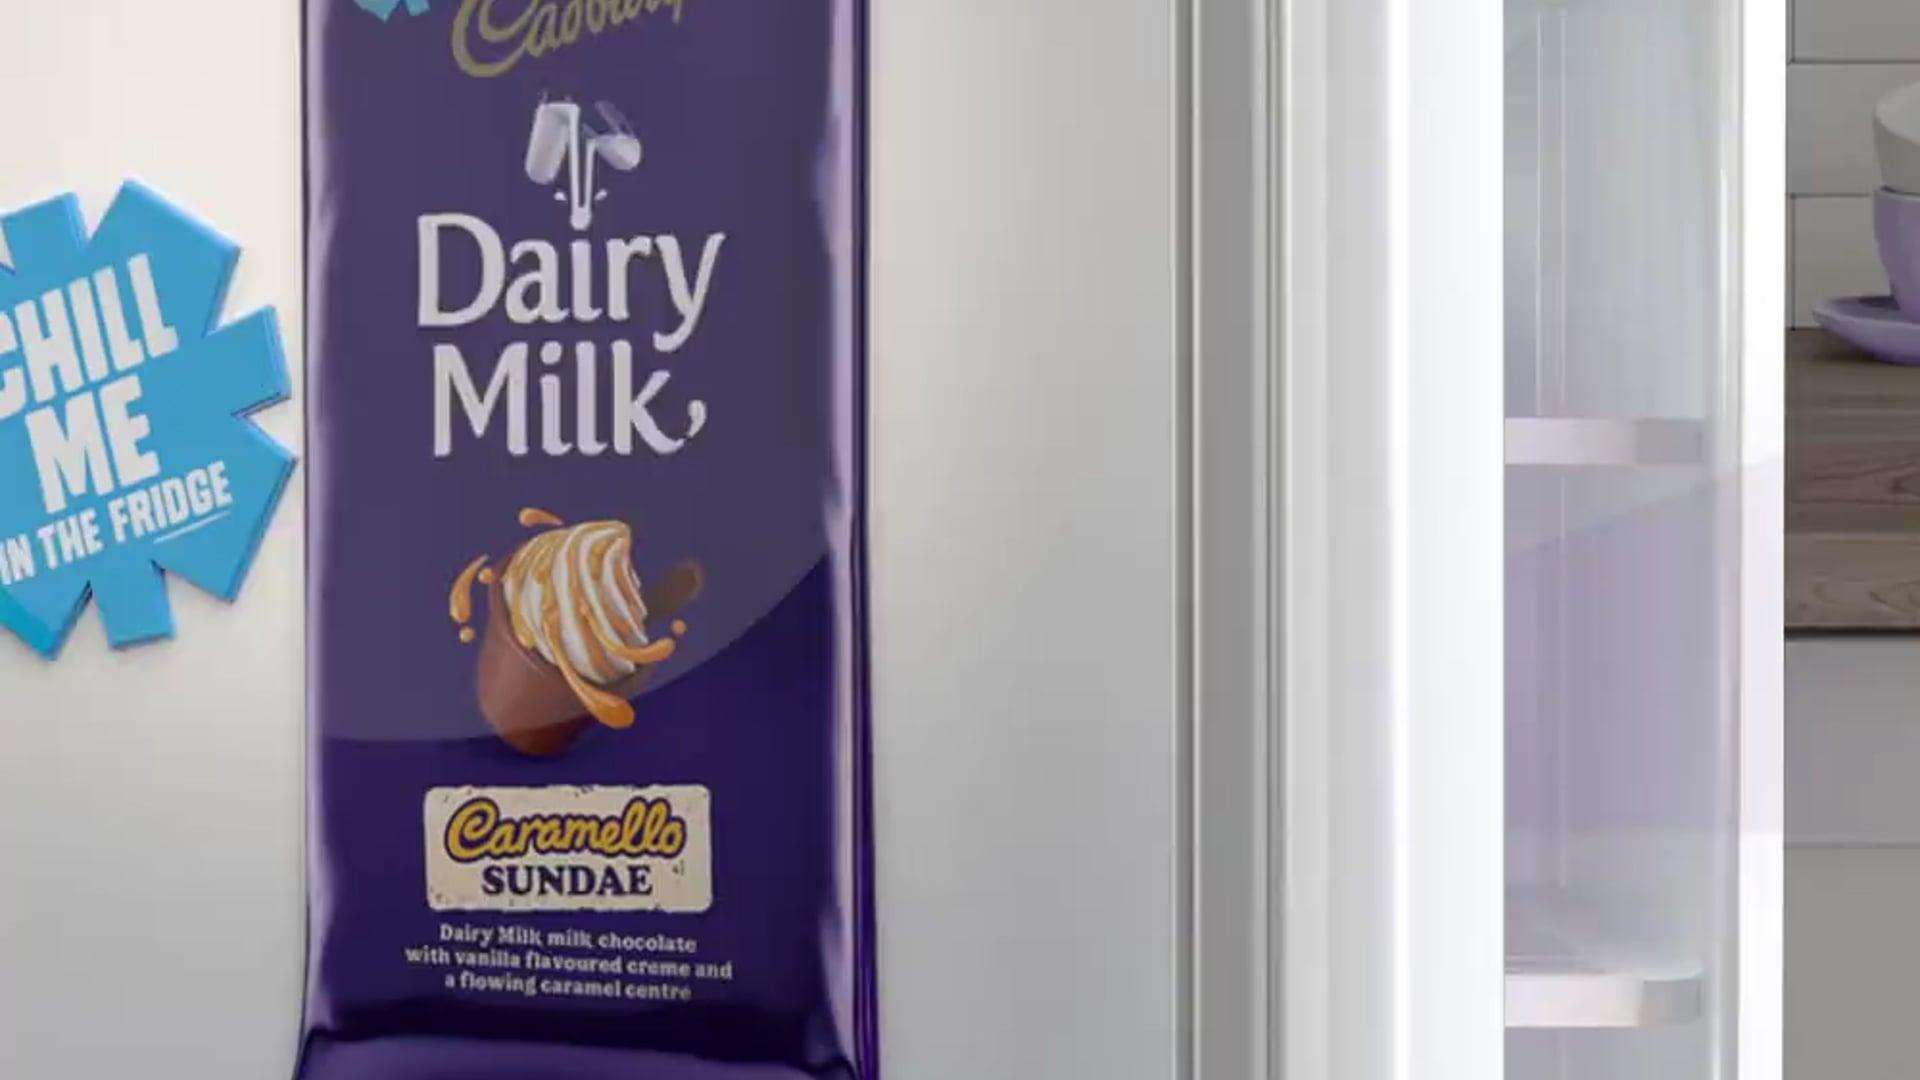 Cadbury Caramello Sundae